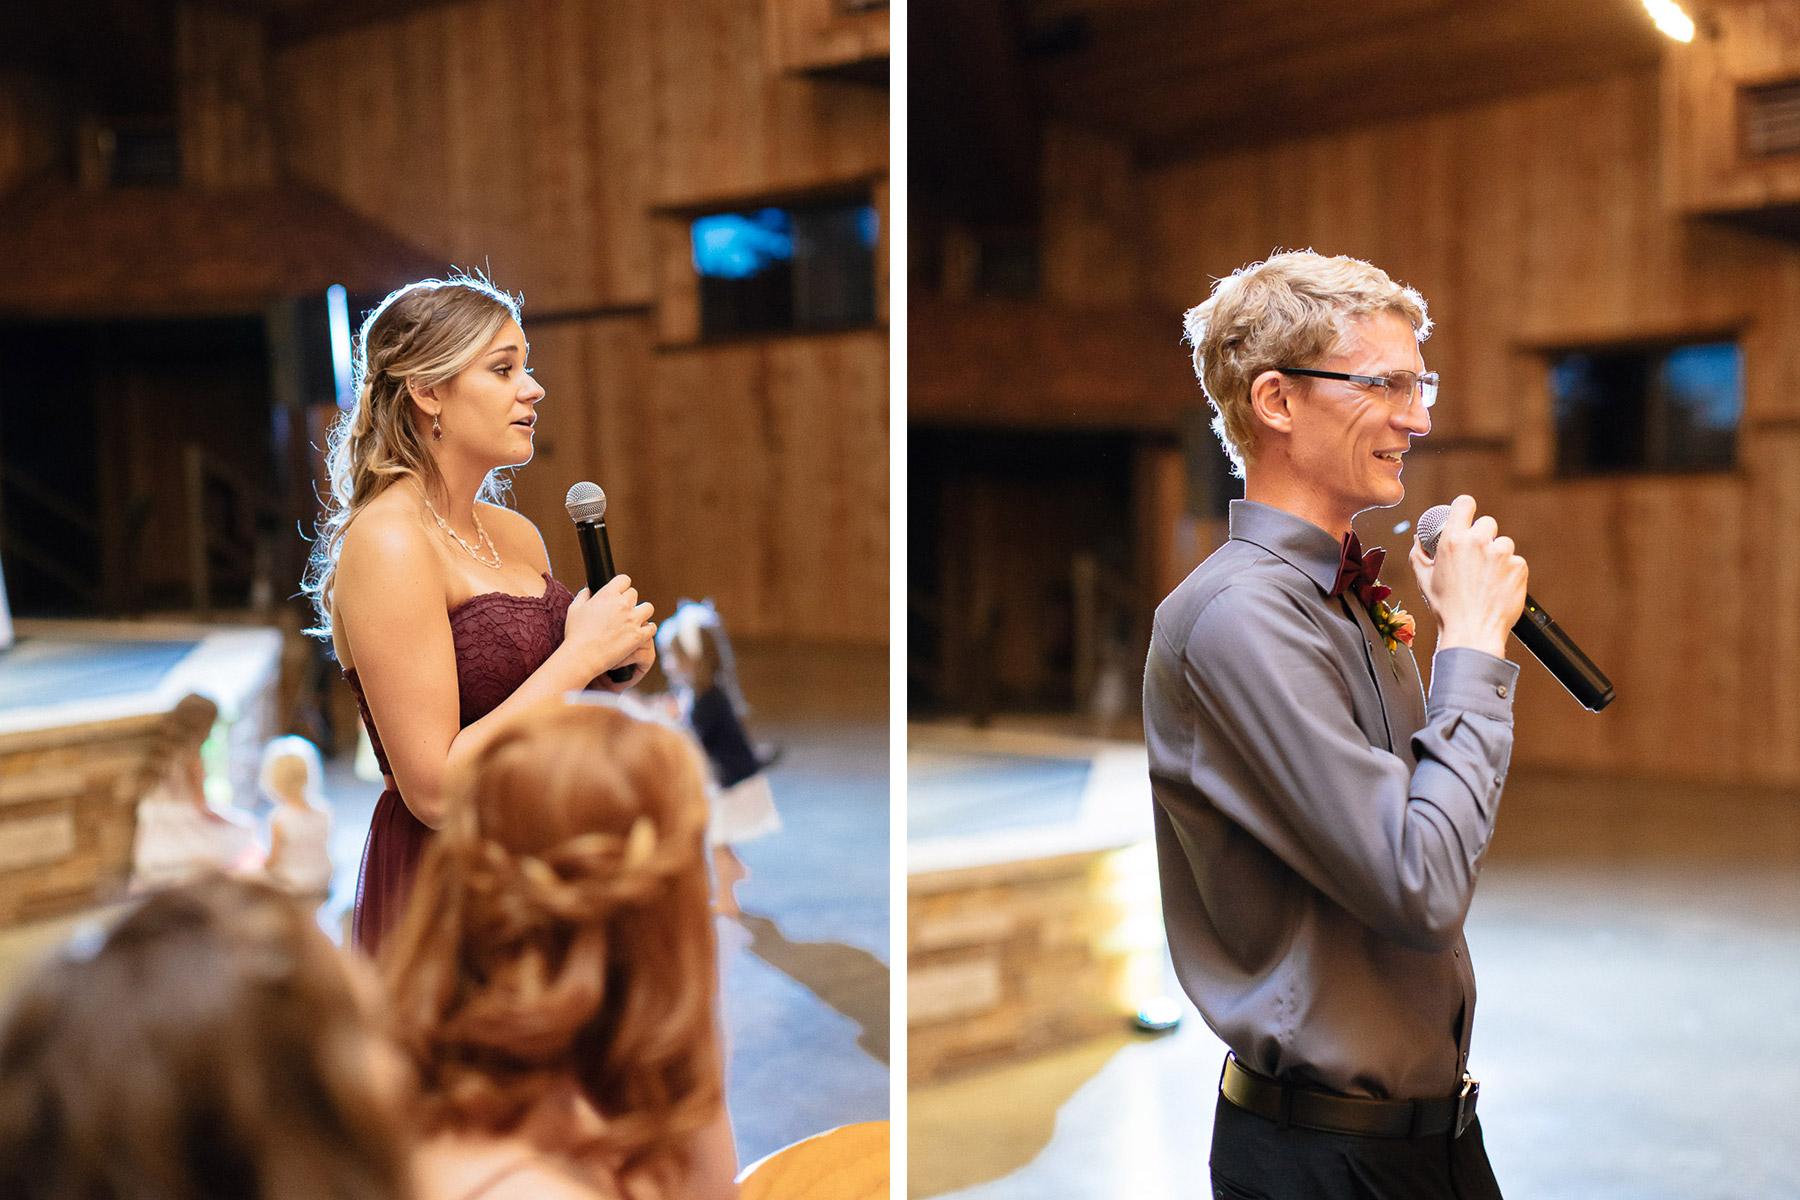 160902-Luxium-Weddings-Arizona-Michael-Becca-Spruce-Mountain-Ranch-Colorado-webres-102a.jpg